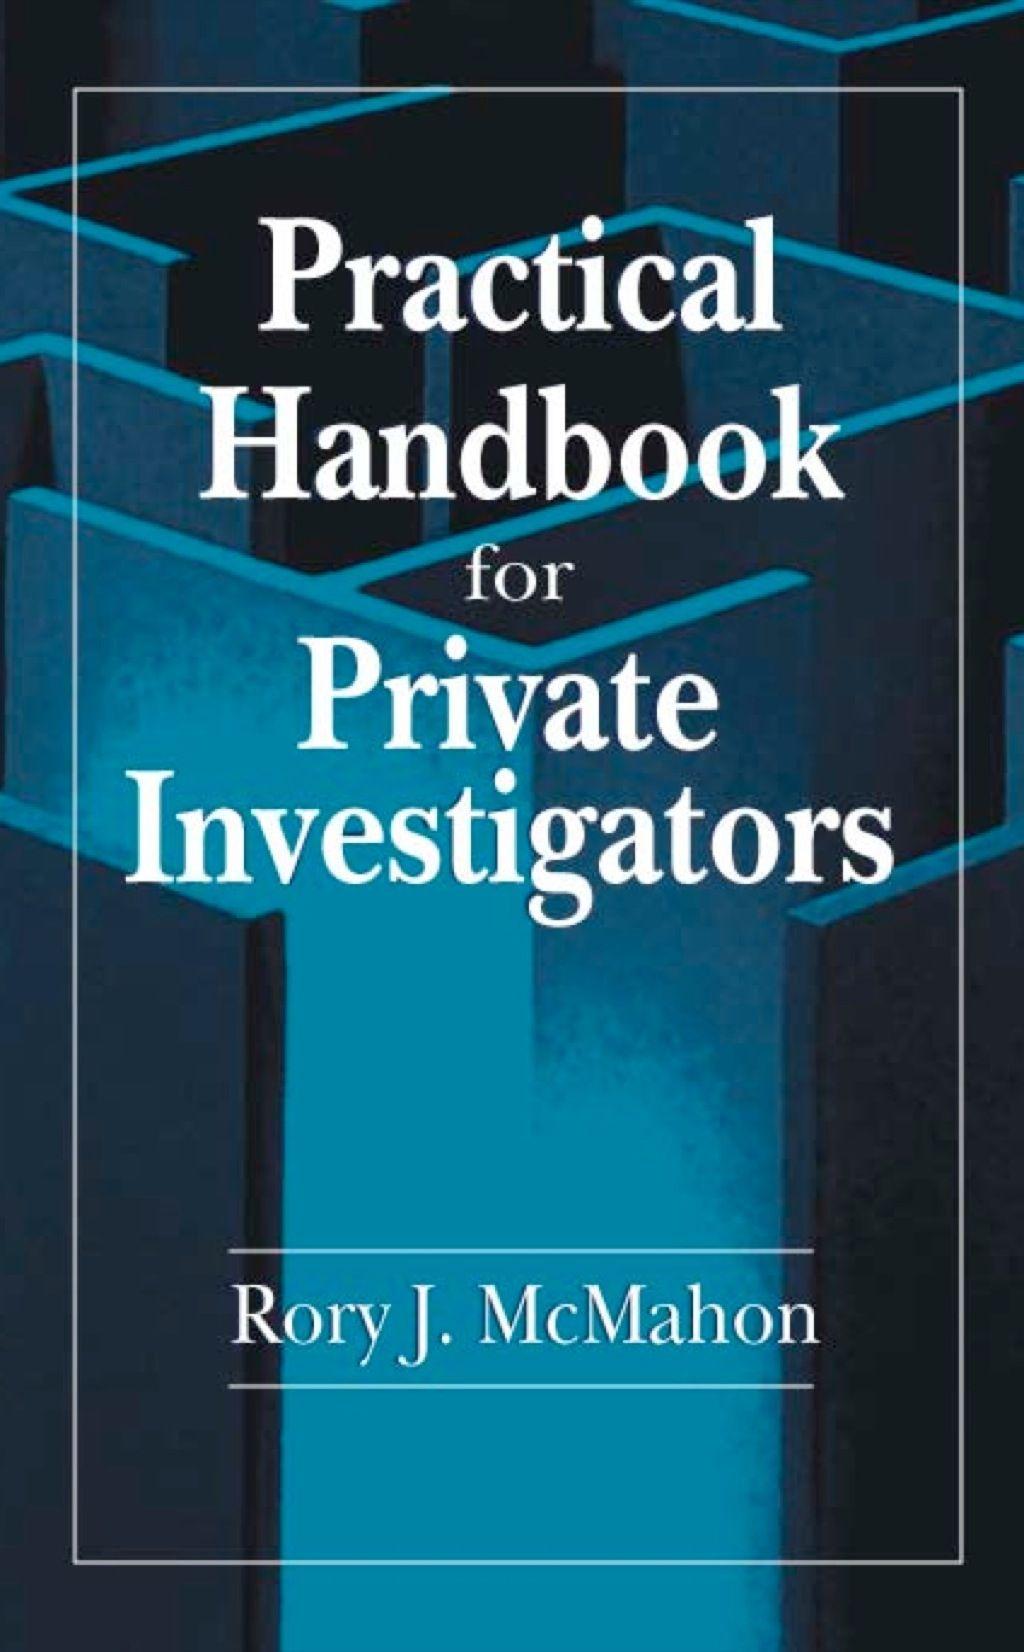 Practical Handbook For Private Investigators Ebook Rental Private Investigator Writing A Book Become A Private Investigator